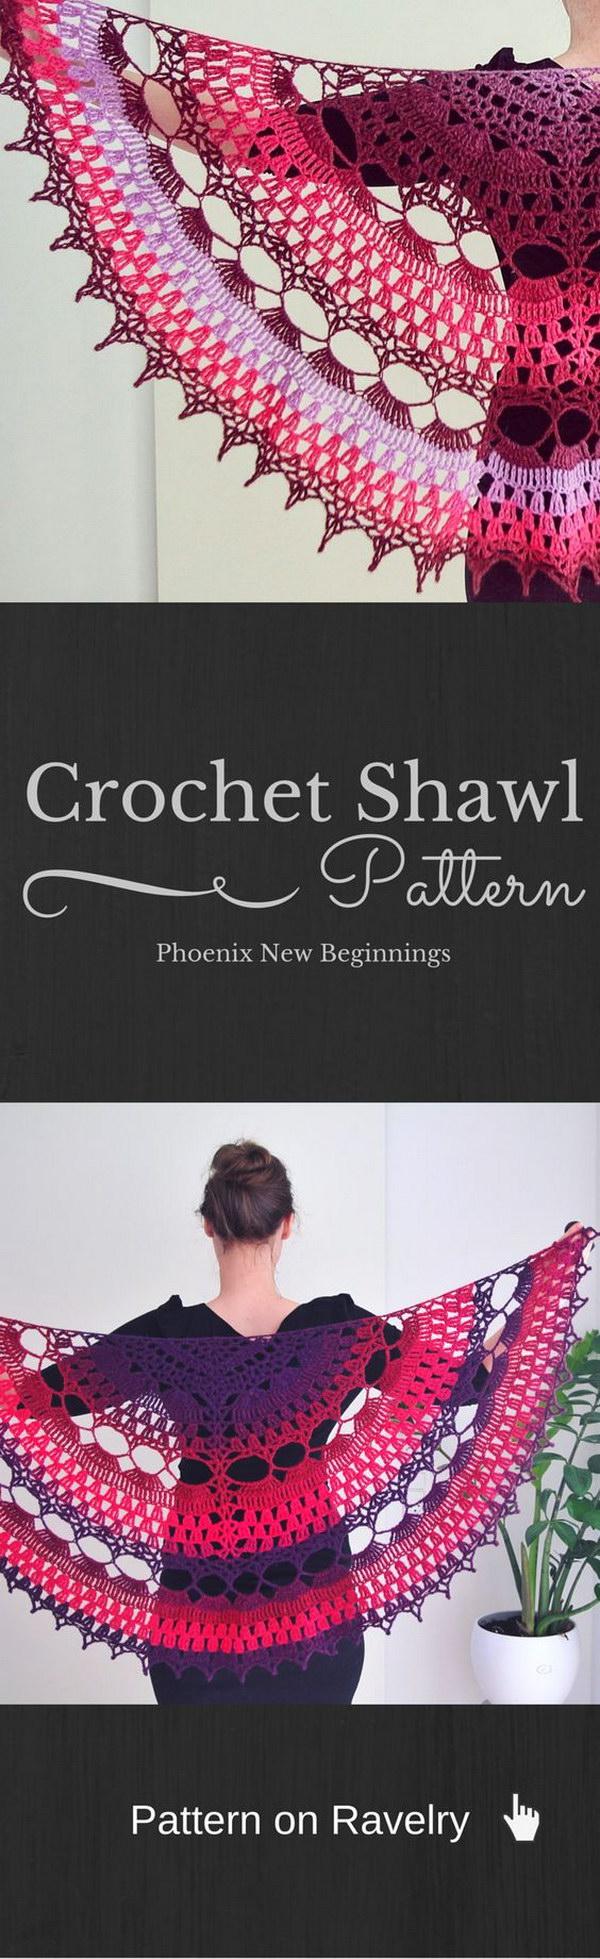 Phoenix New Beginnings.